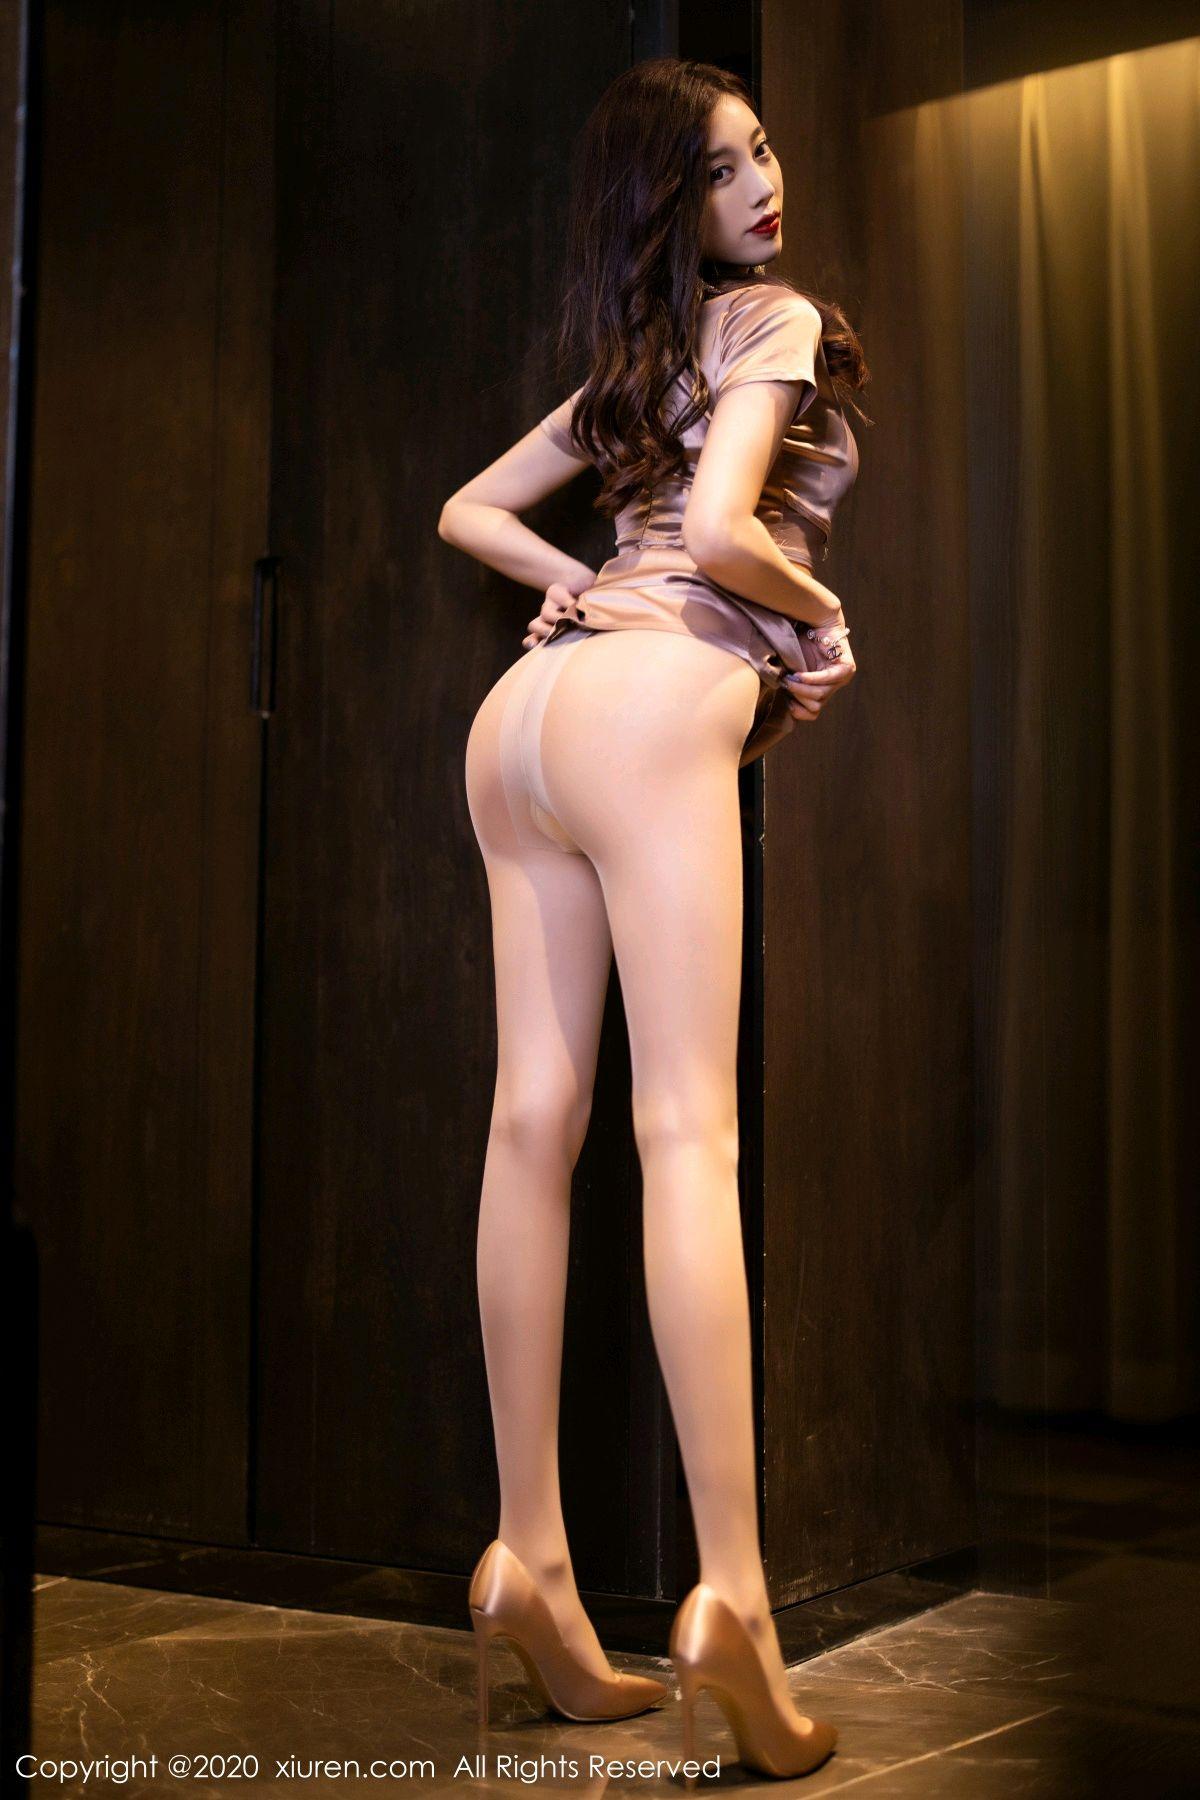 [XiuRen] Vol.2587 Yang Chen Chen 77P, Underwear, Xiuren, Yang Chen Chen